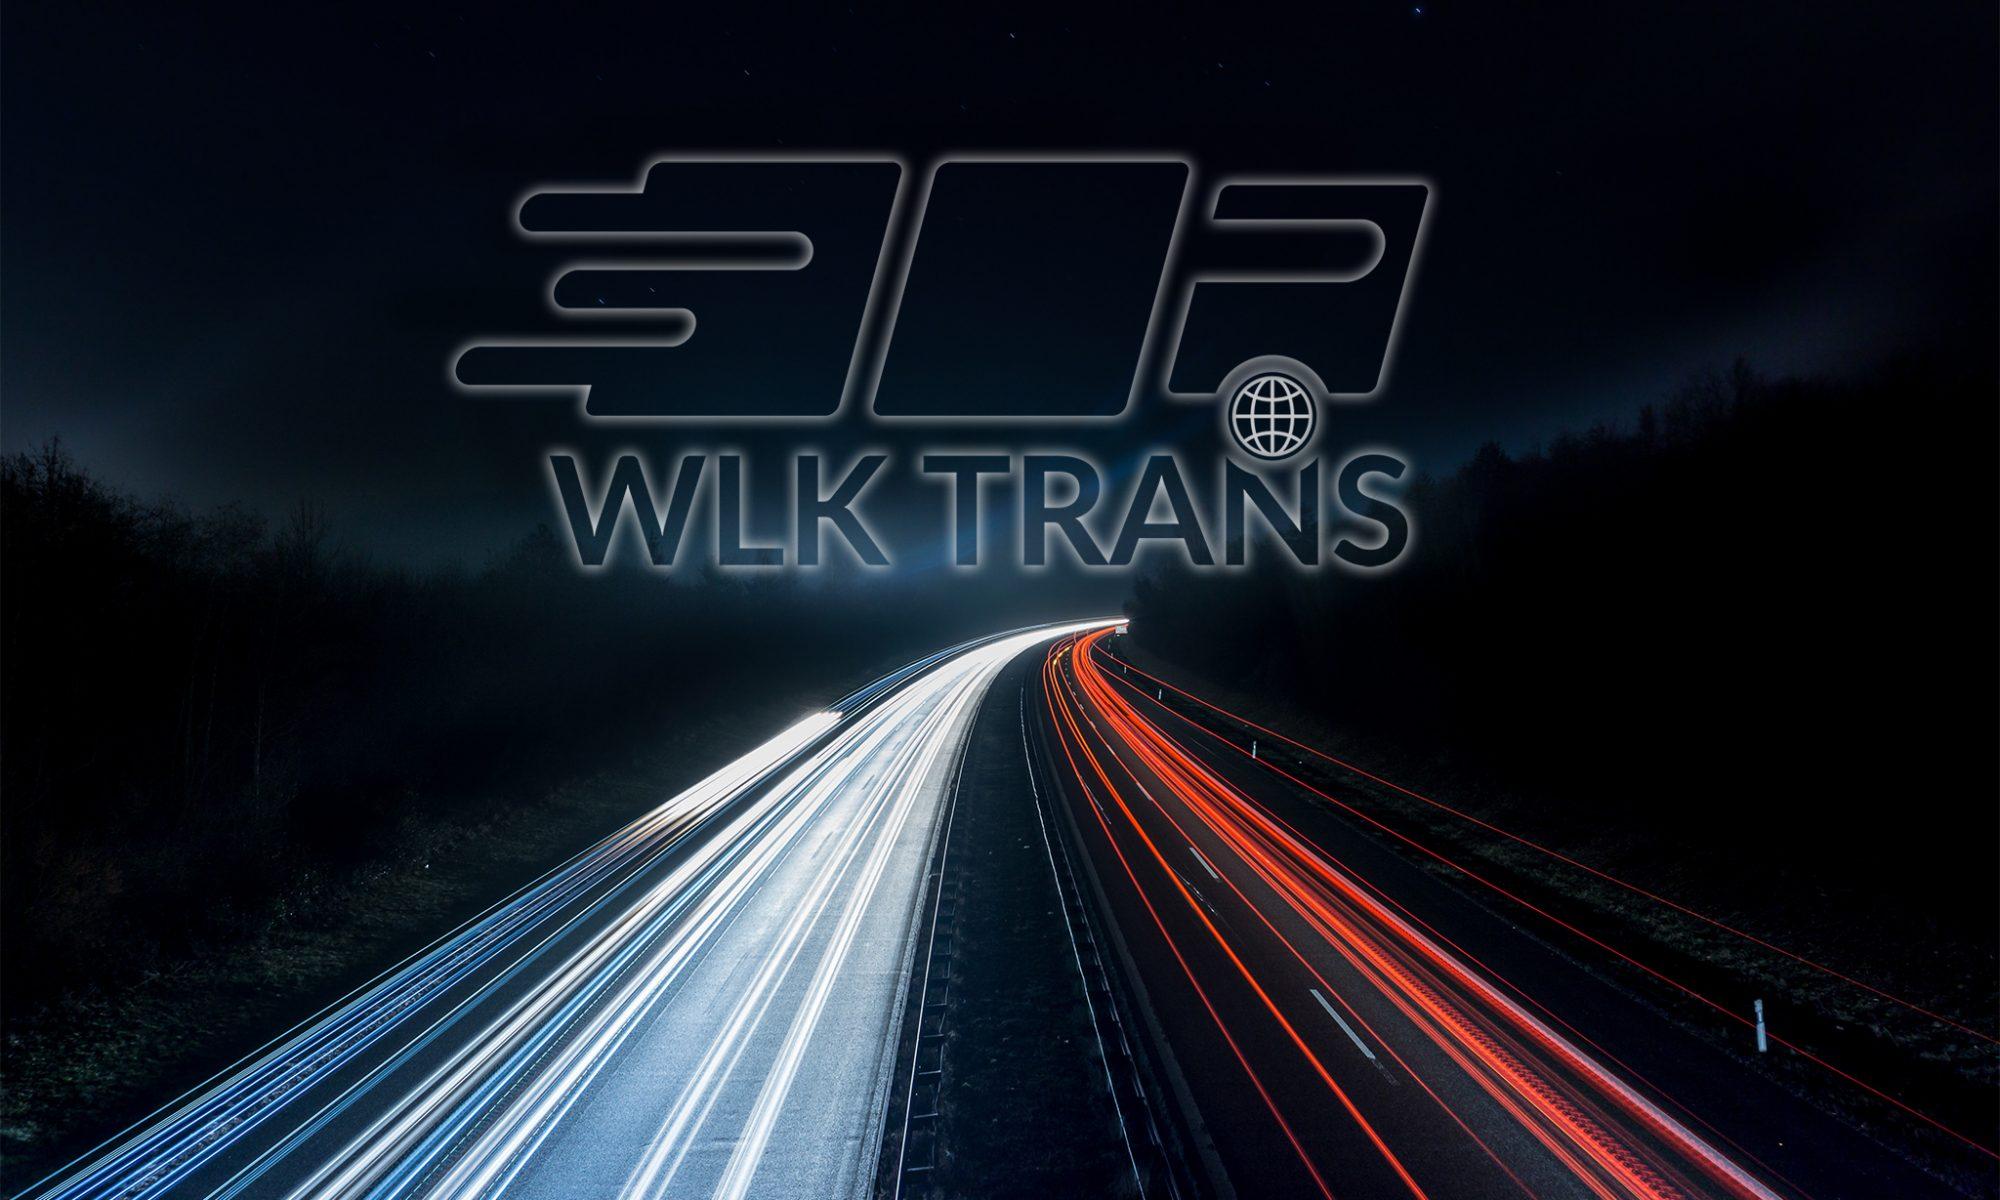 WLK Trans